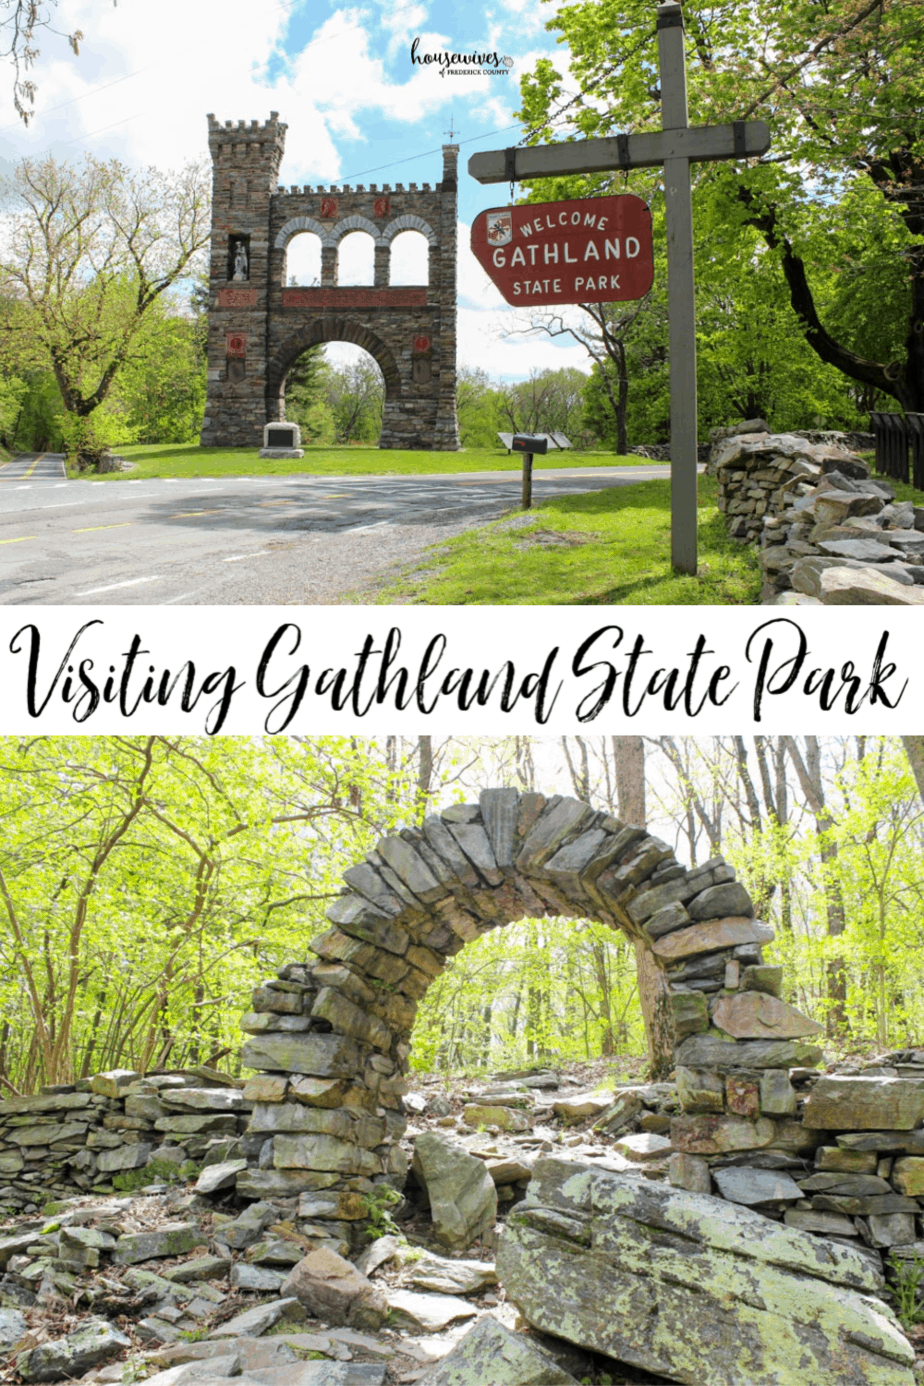 Visiting Gathland State Park & National War Correspondents Memorial Arch